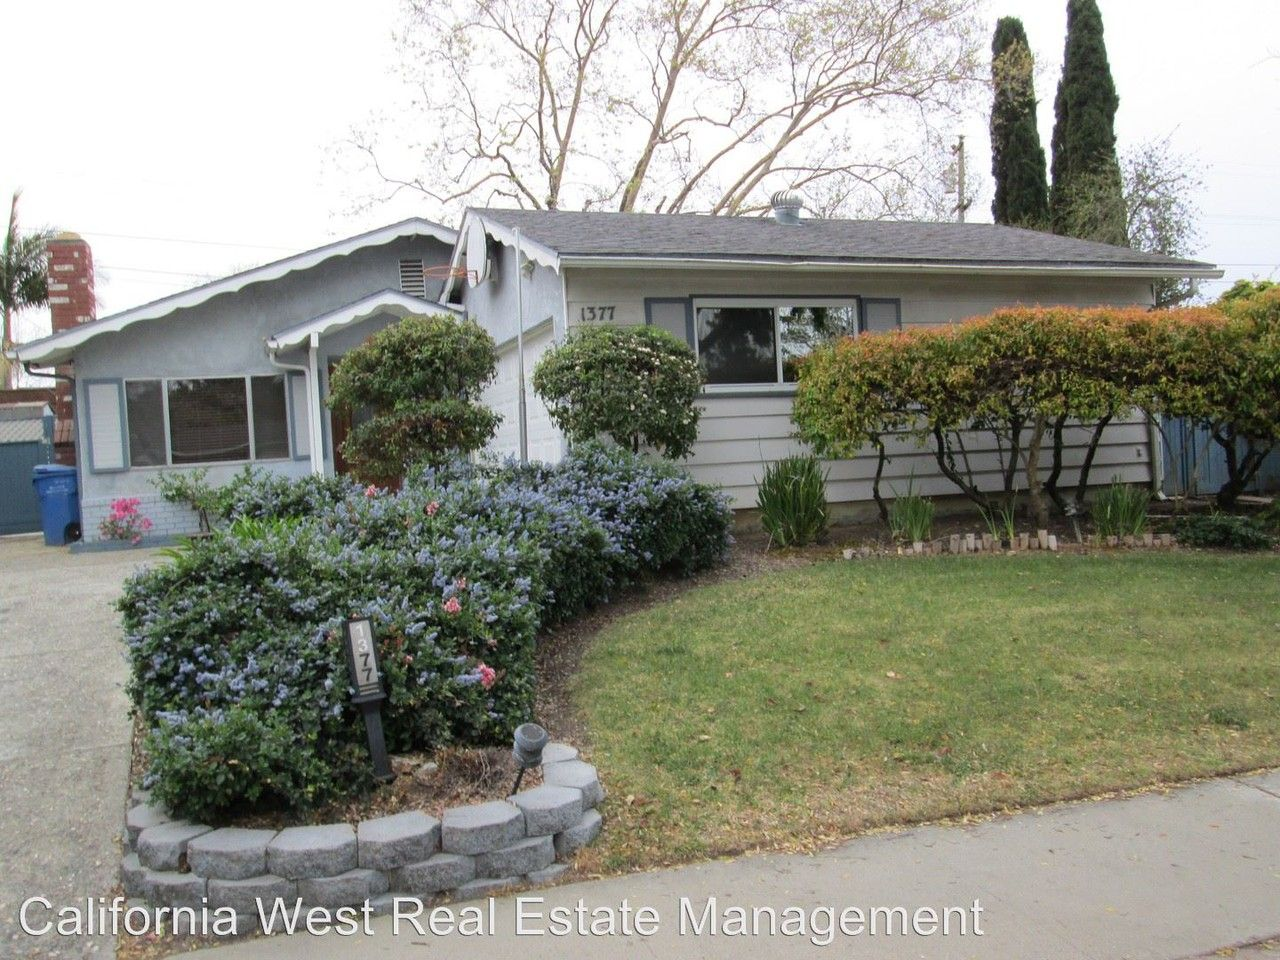 1377 Woodside Dr San Luis Obispo Ca 93401 5 Bedroom